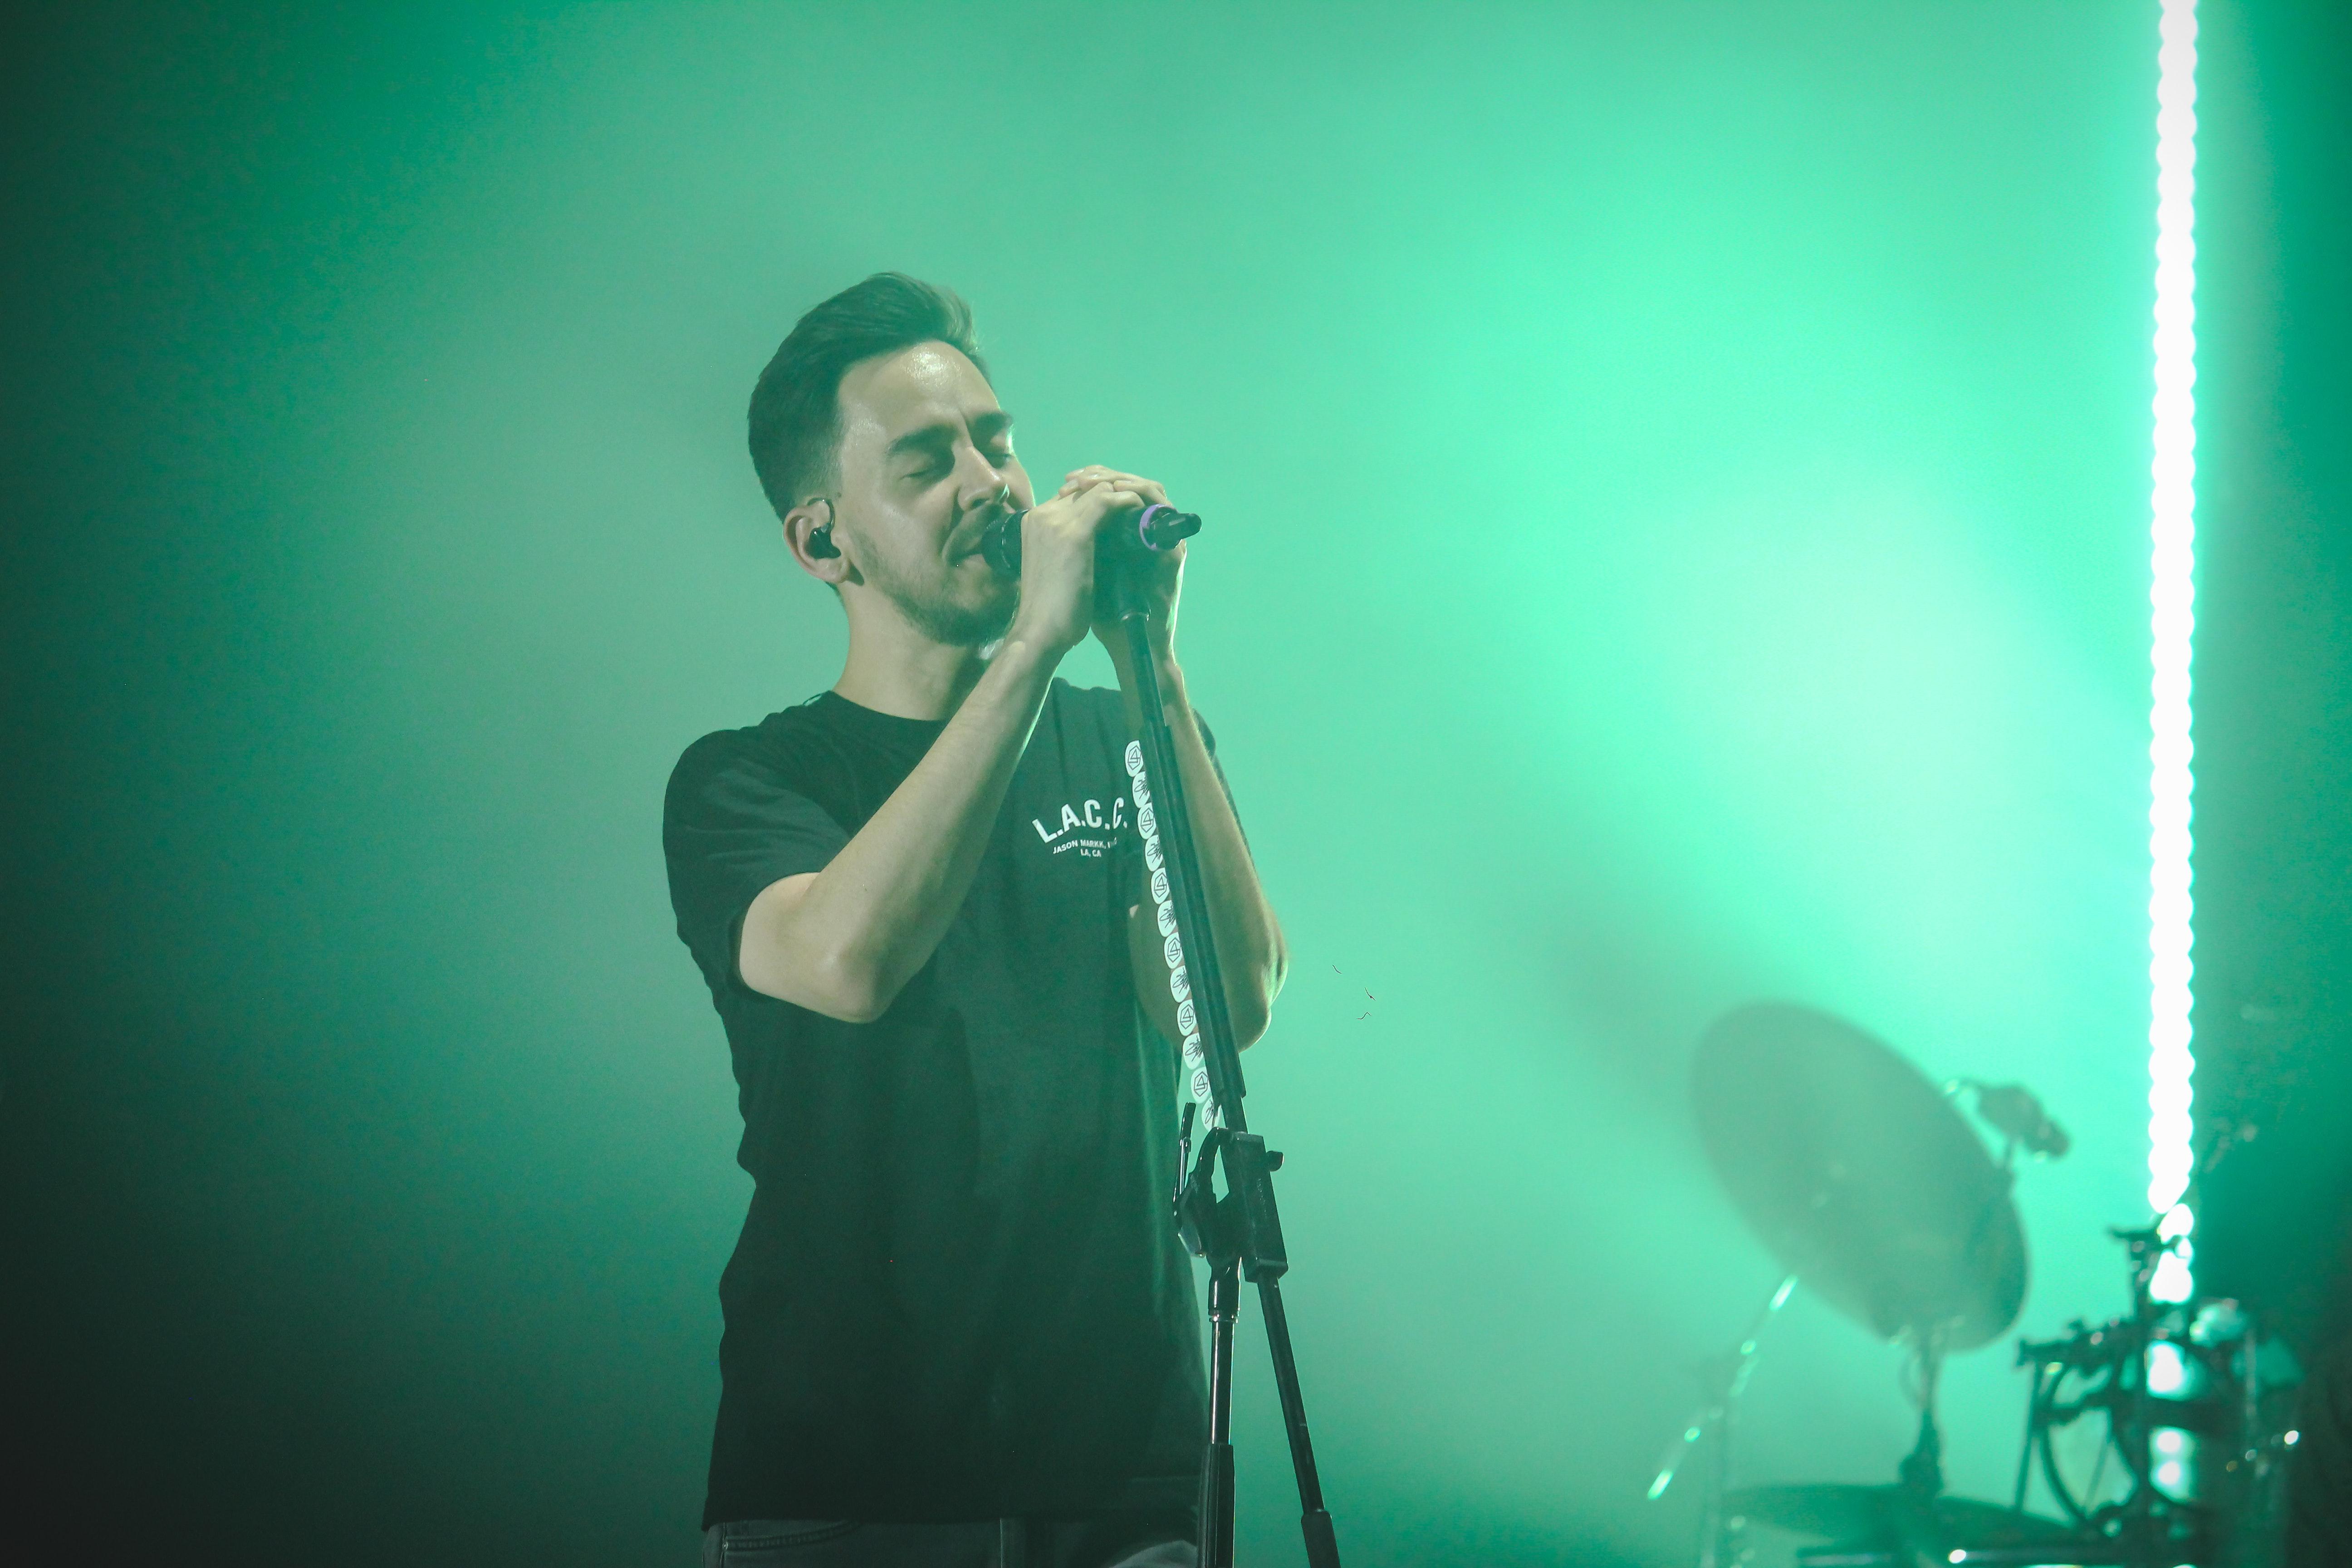 Man wearing black crew-neck t-shirt holding microphone photo